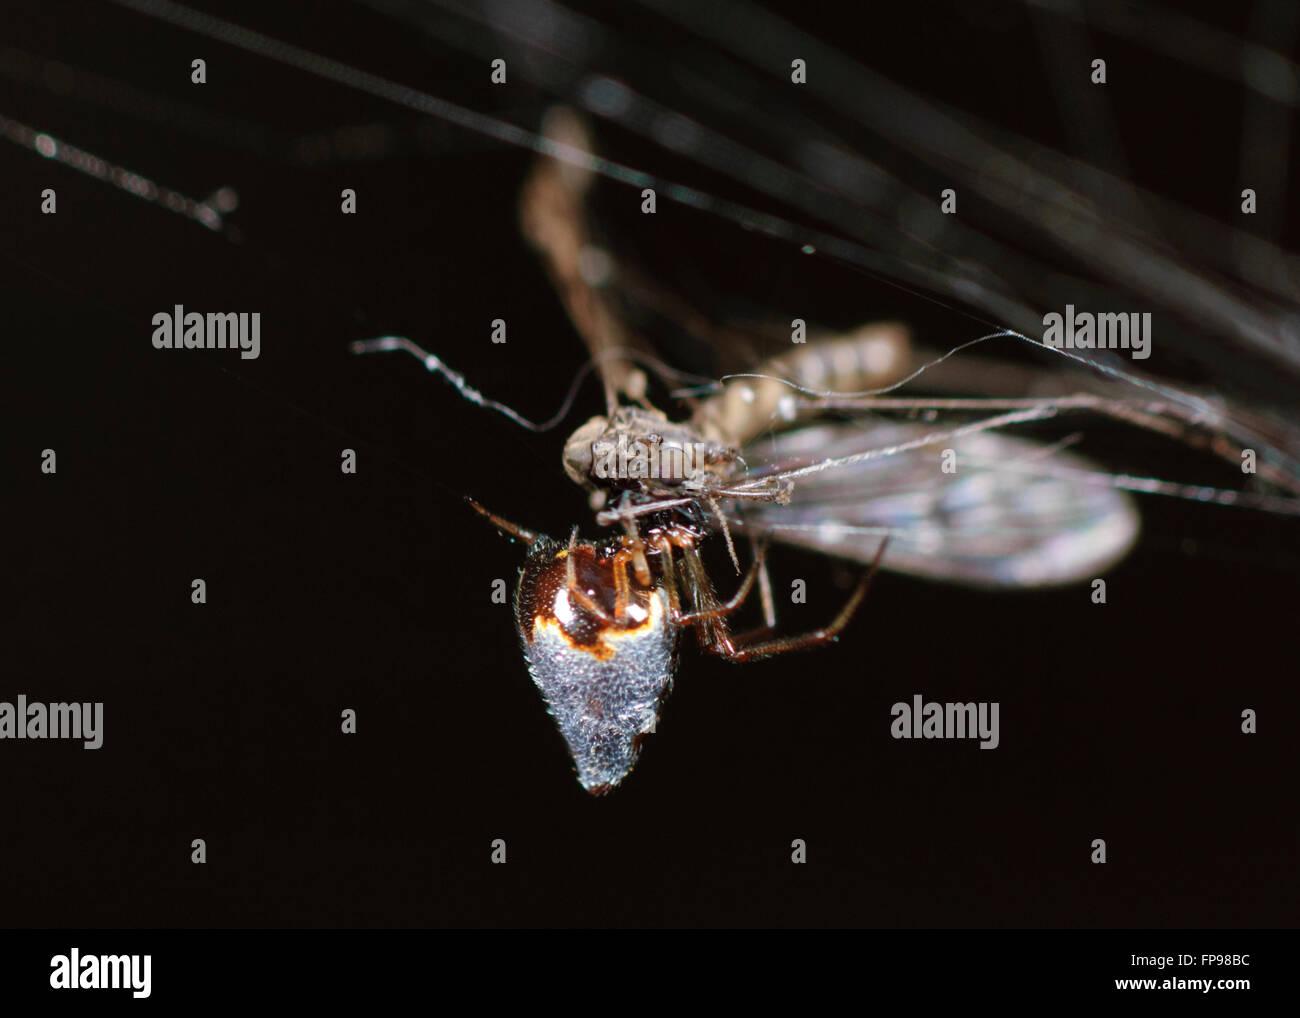 Silver Tear-drop Spider or Dew-drop Spider (Argyrodes antipodianus) with Prey, Western Australia, Australia - Stock Image